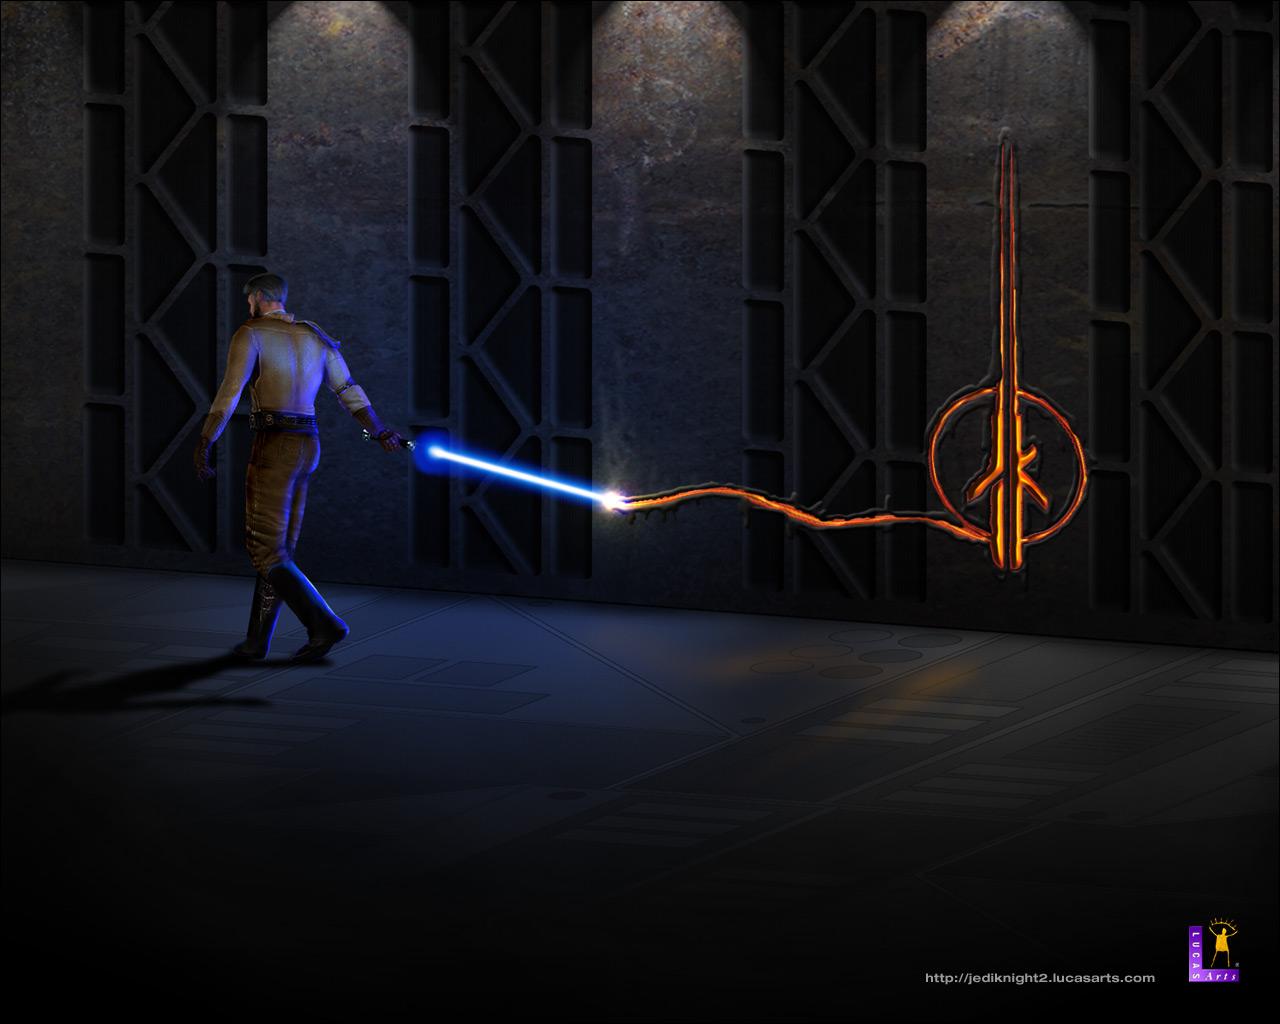 star wars jedi knight ii jedi outcast jk2 jo El código fuente de Jedi Knight 2: Jedi Outcast y Jedi Academy liberados bajo licencia GPLv2